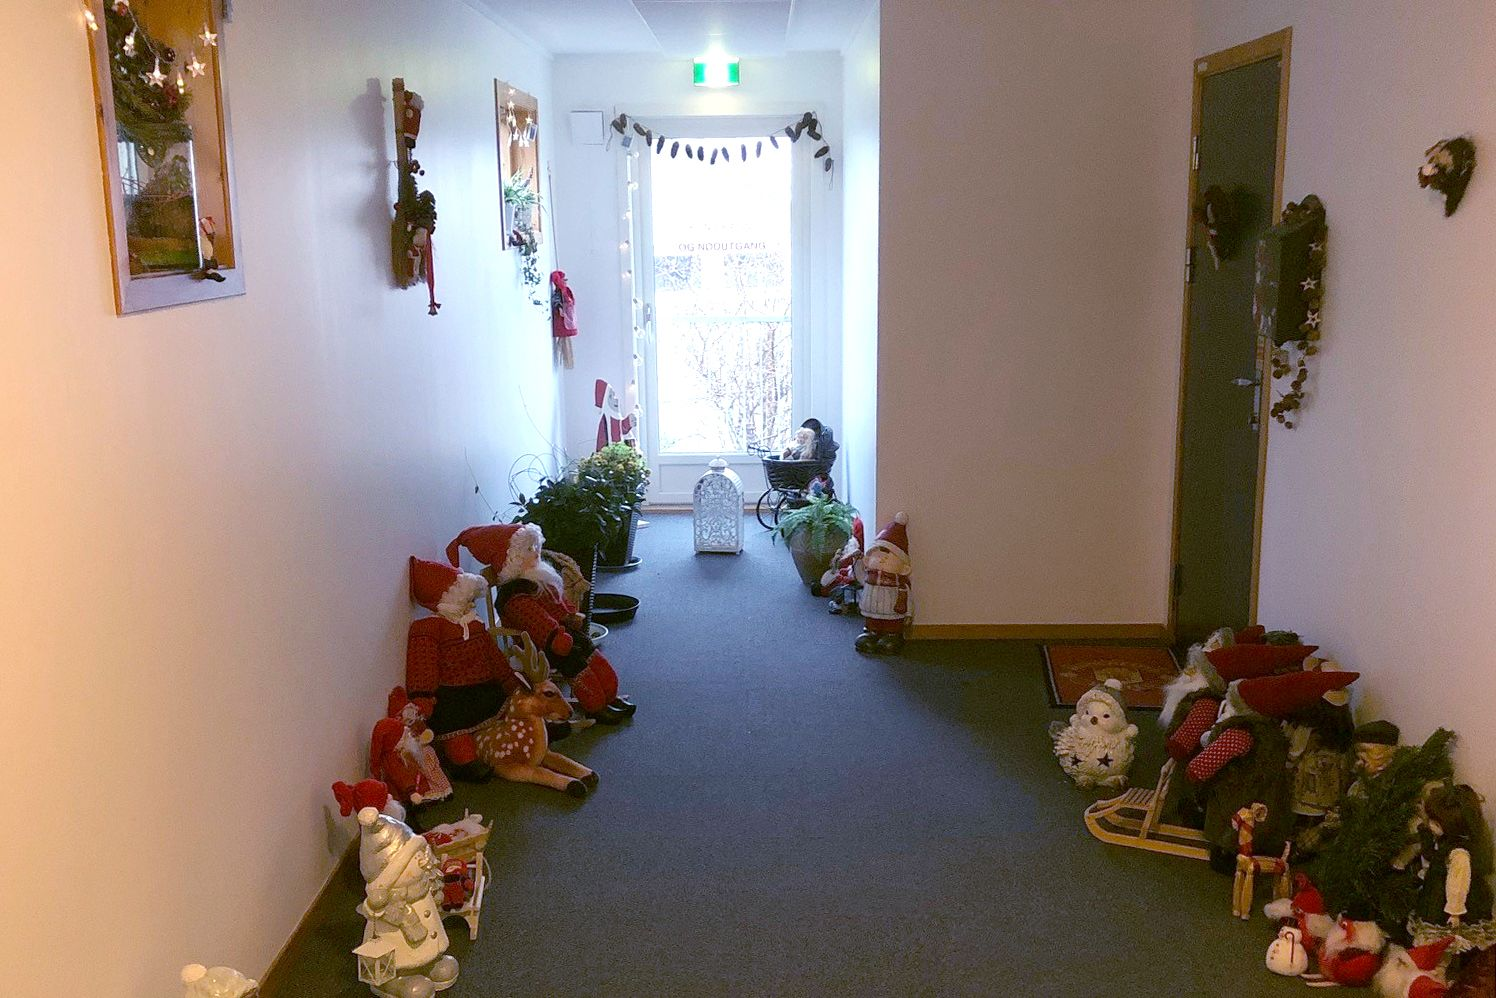 Julepynt i gang i boligblokk